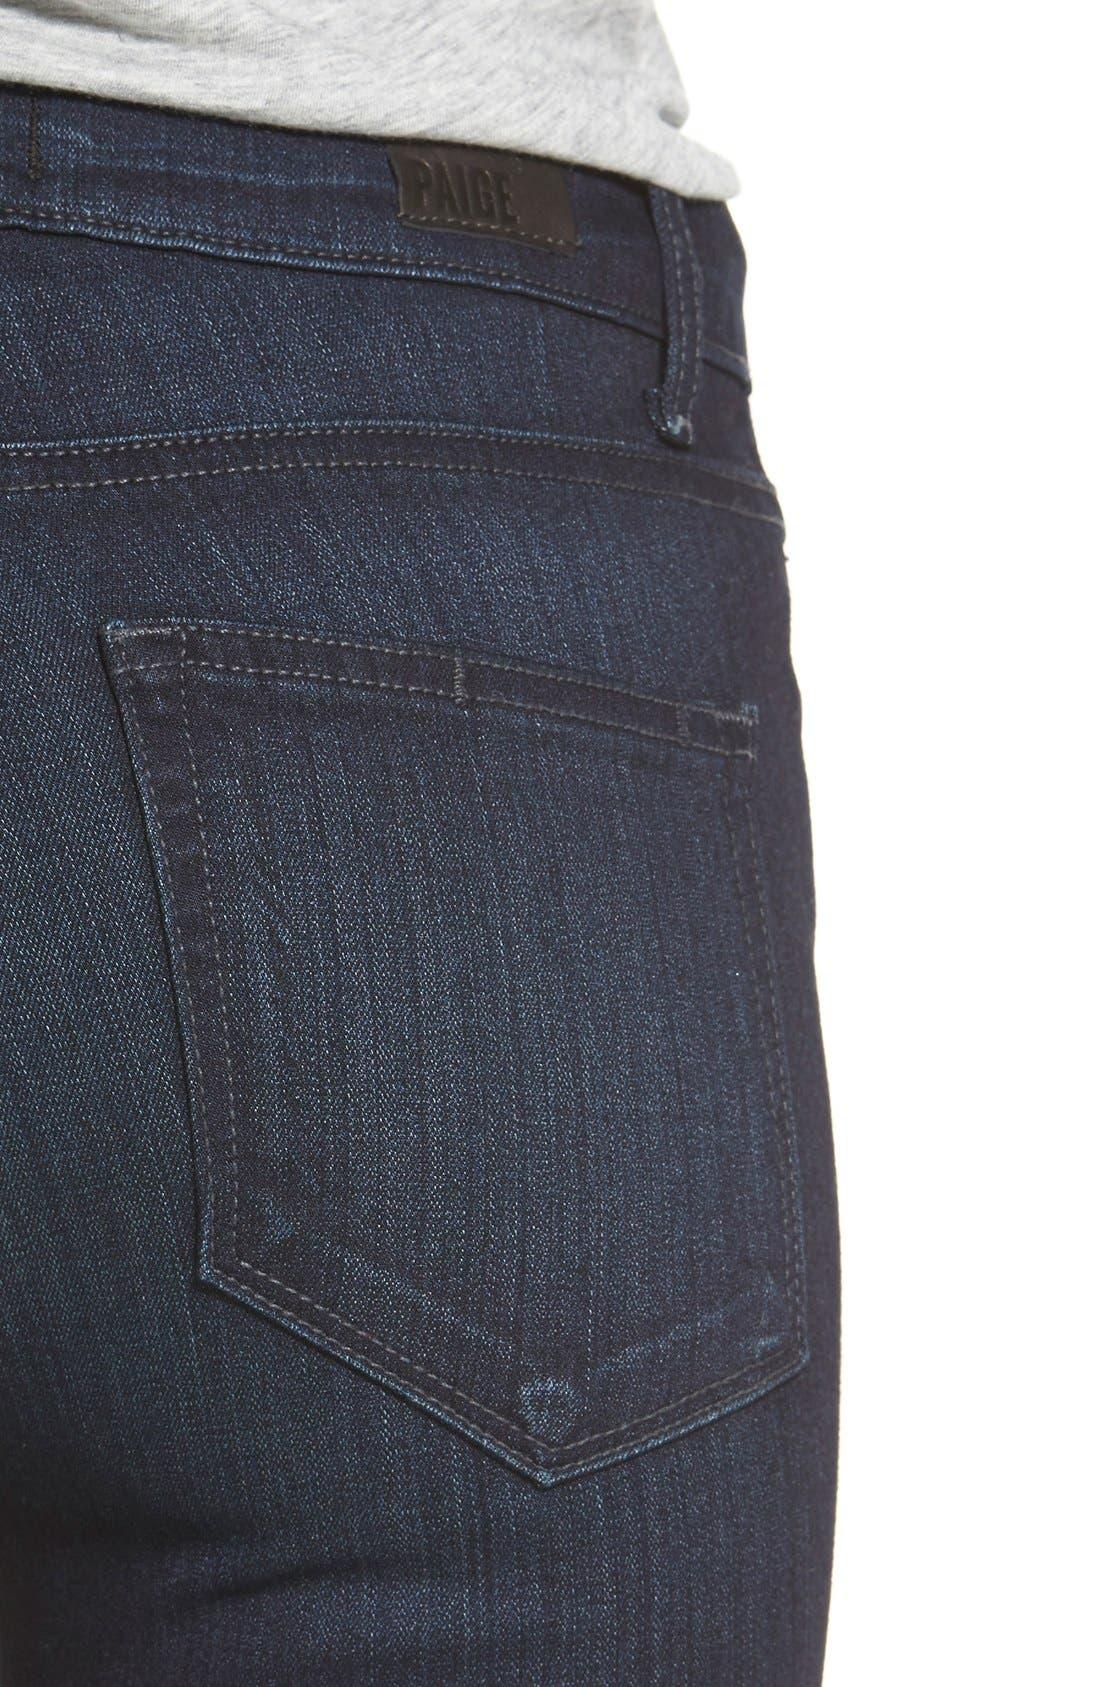 Denim 'Transcend - Hoxton' High Rise Ankle Skinny Jeans,                             Alternate thumbnail 4, color,                             400